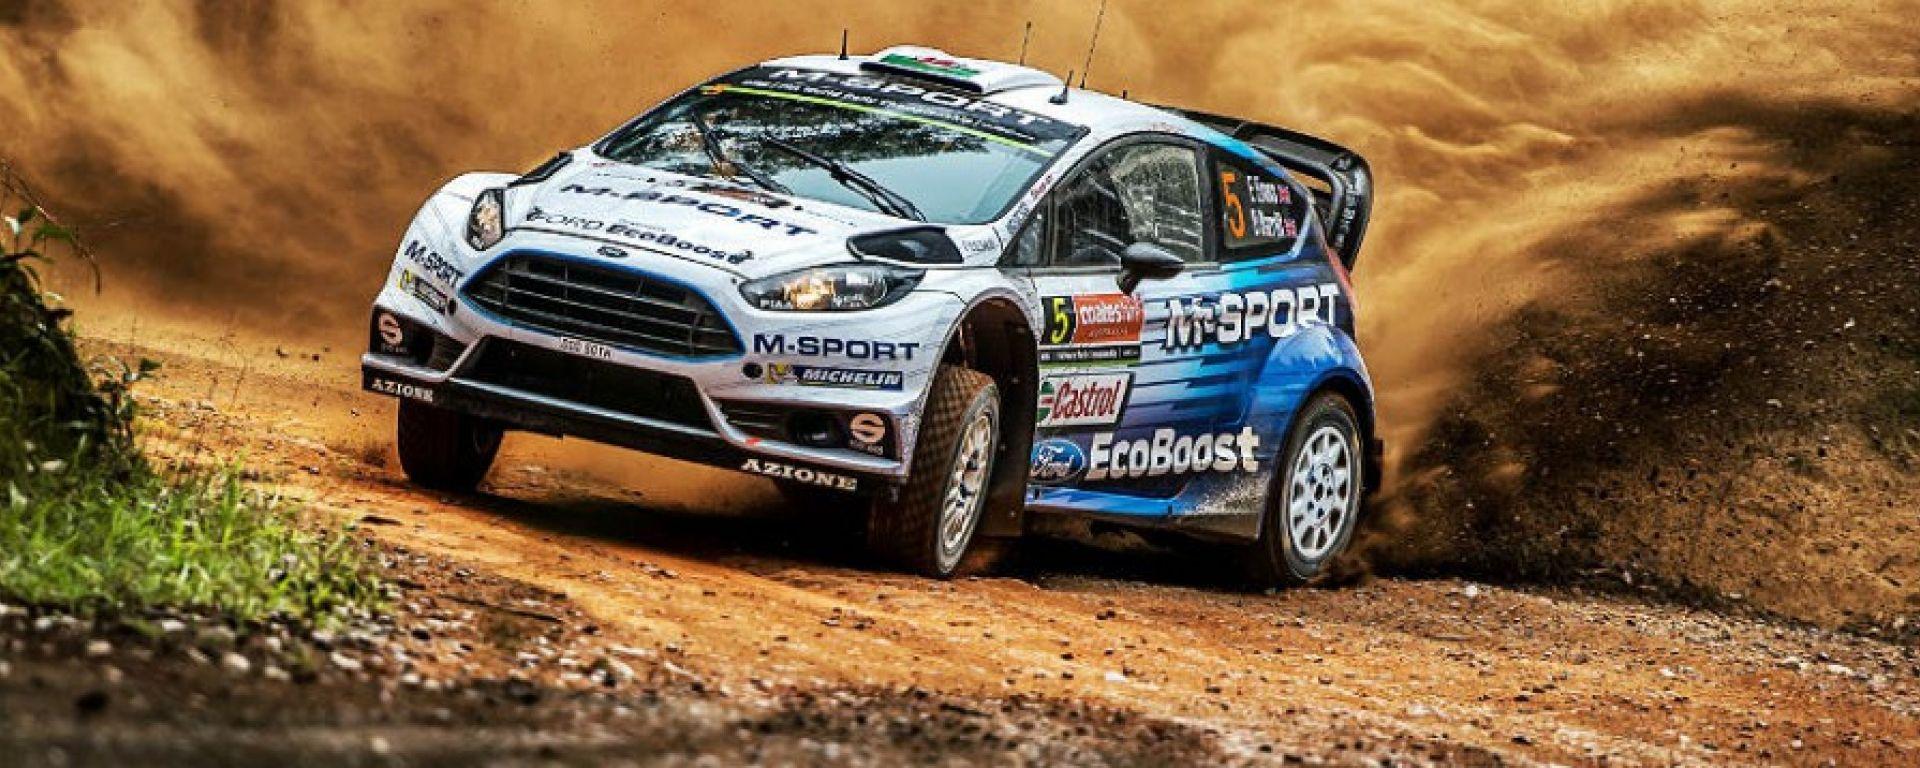 WRC 2016 Rally d'Australia